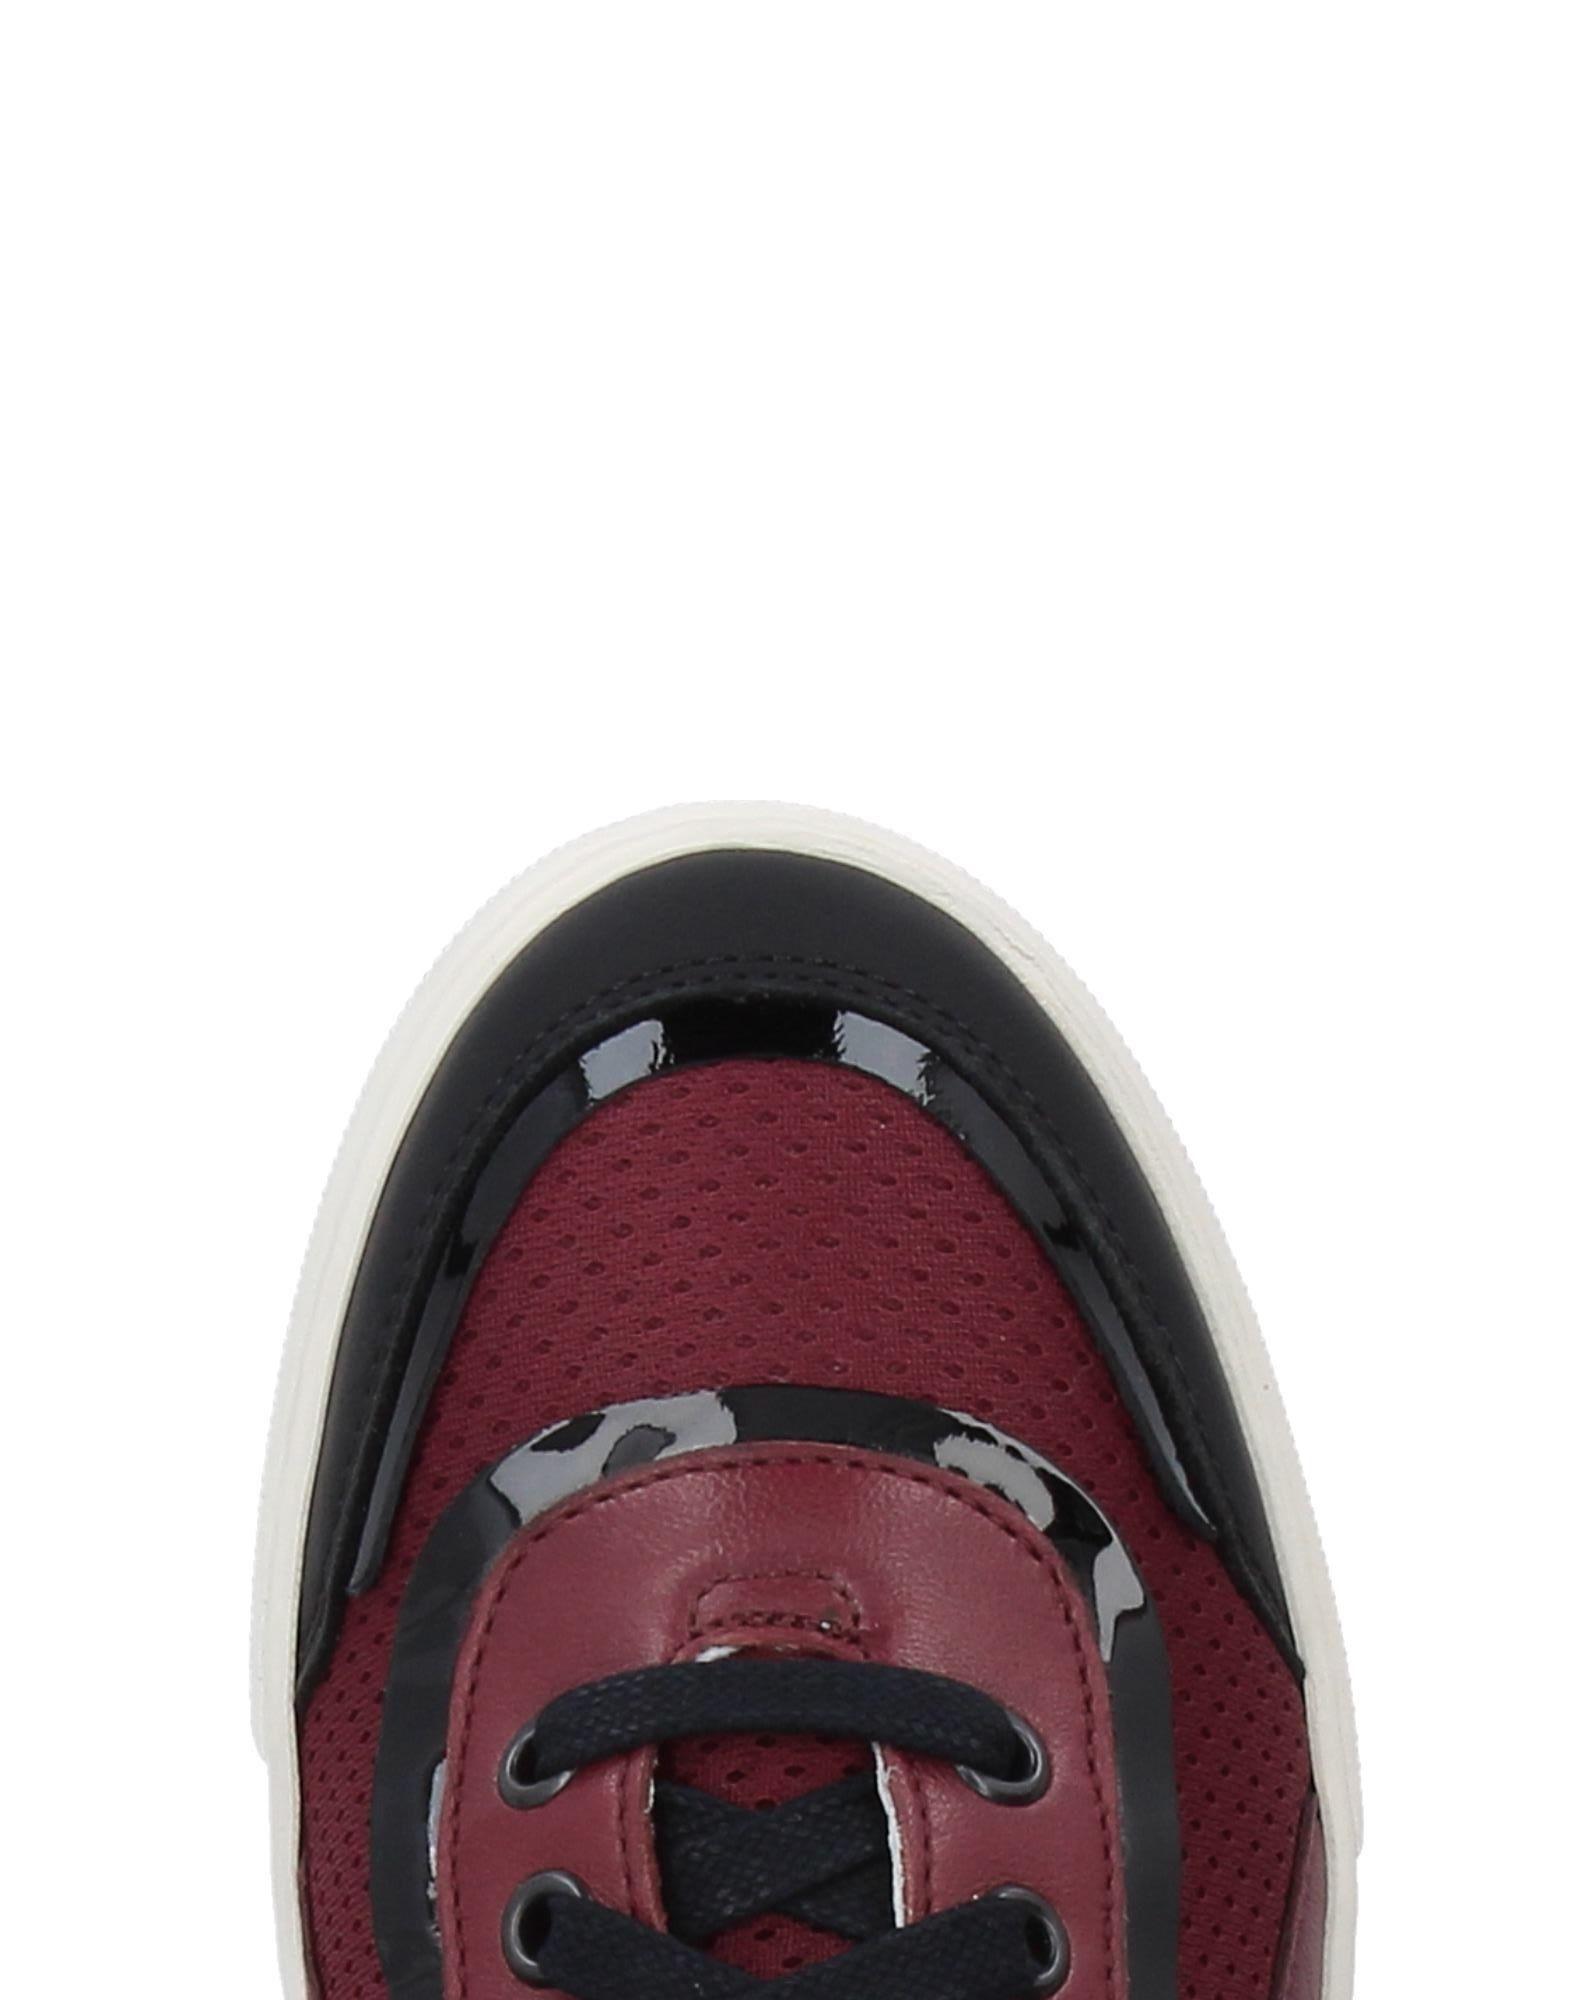 Lanvin Sneakers Damen  11369586WOGut aussehende strapazierfähige Schuhe